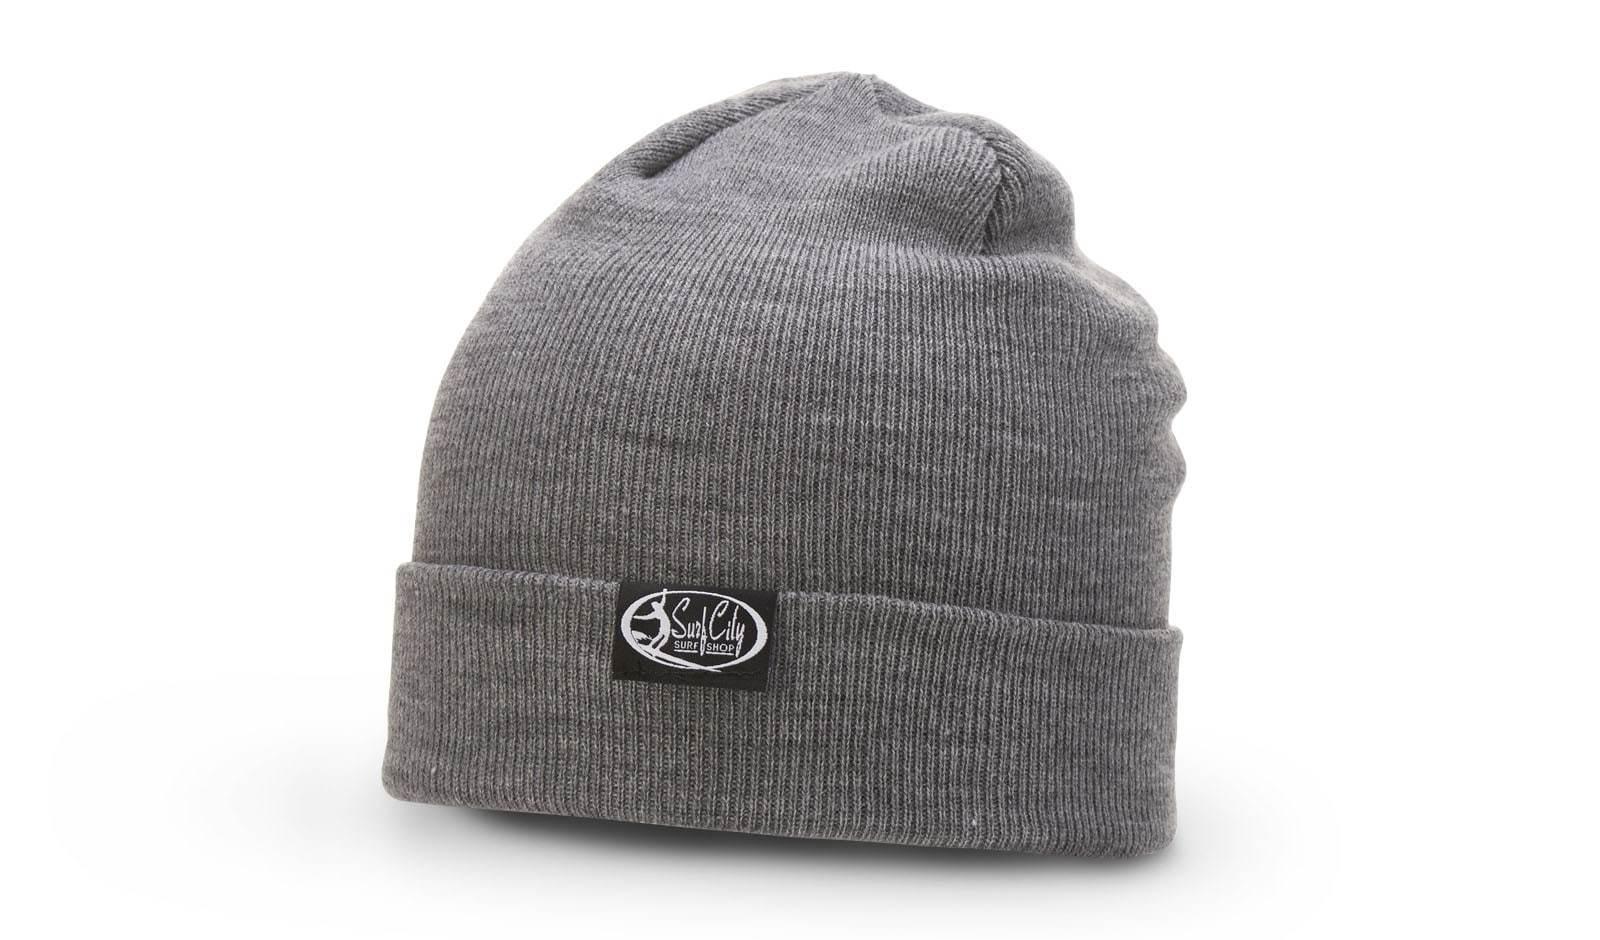 08428950cf612 Wholesale - Richardson - Page 1 - The Hat Pros